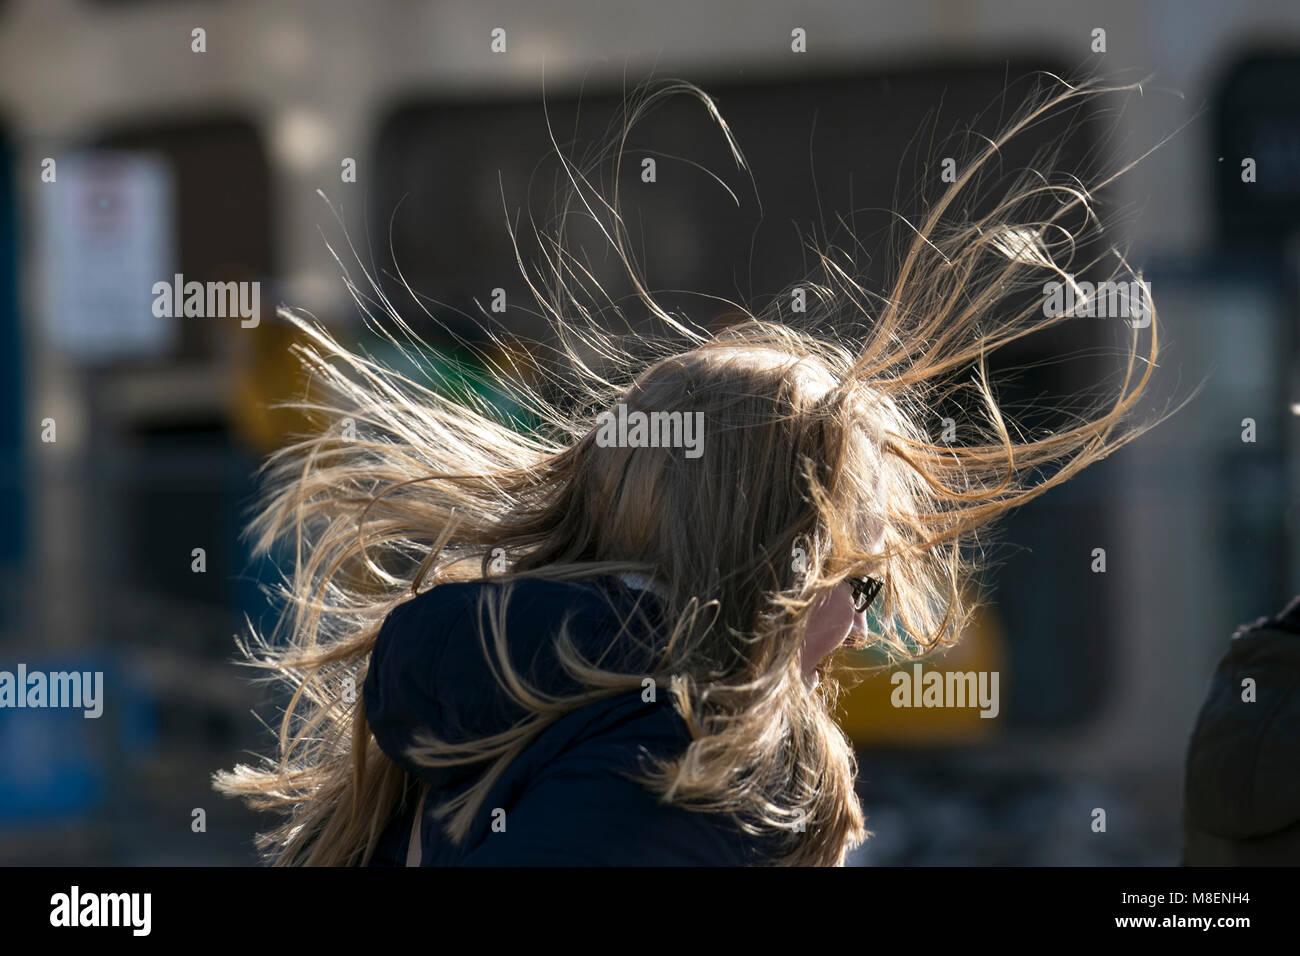 Il Freddo Quando Arriva hair raiser stock photos & hair raiser stock images - alamy